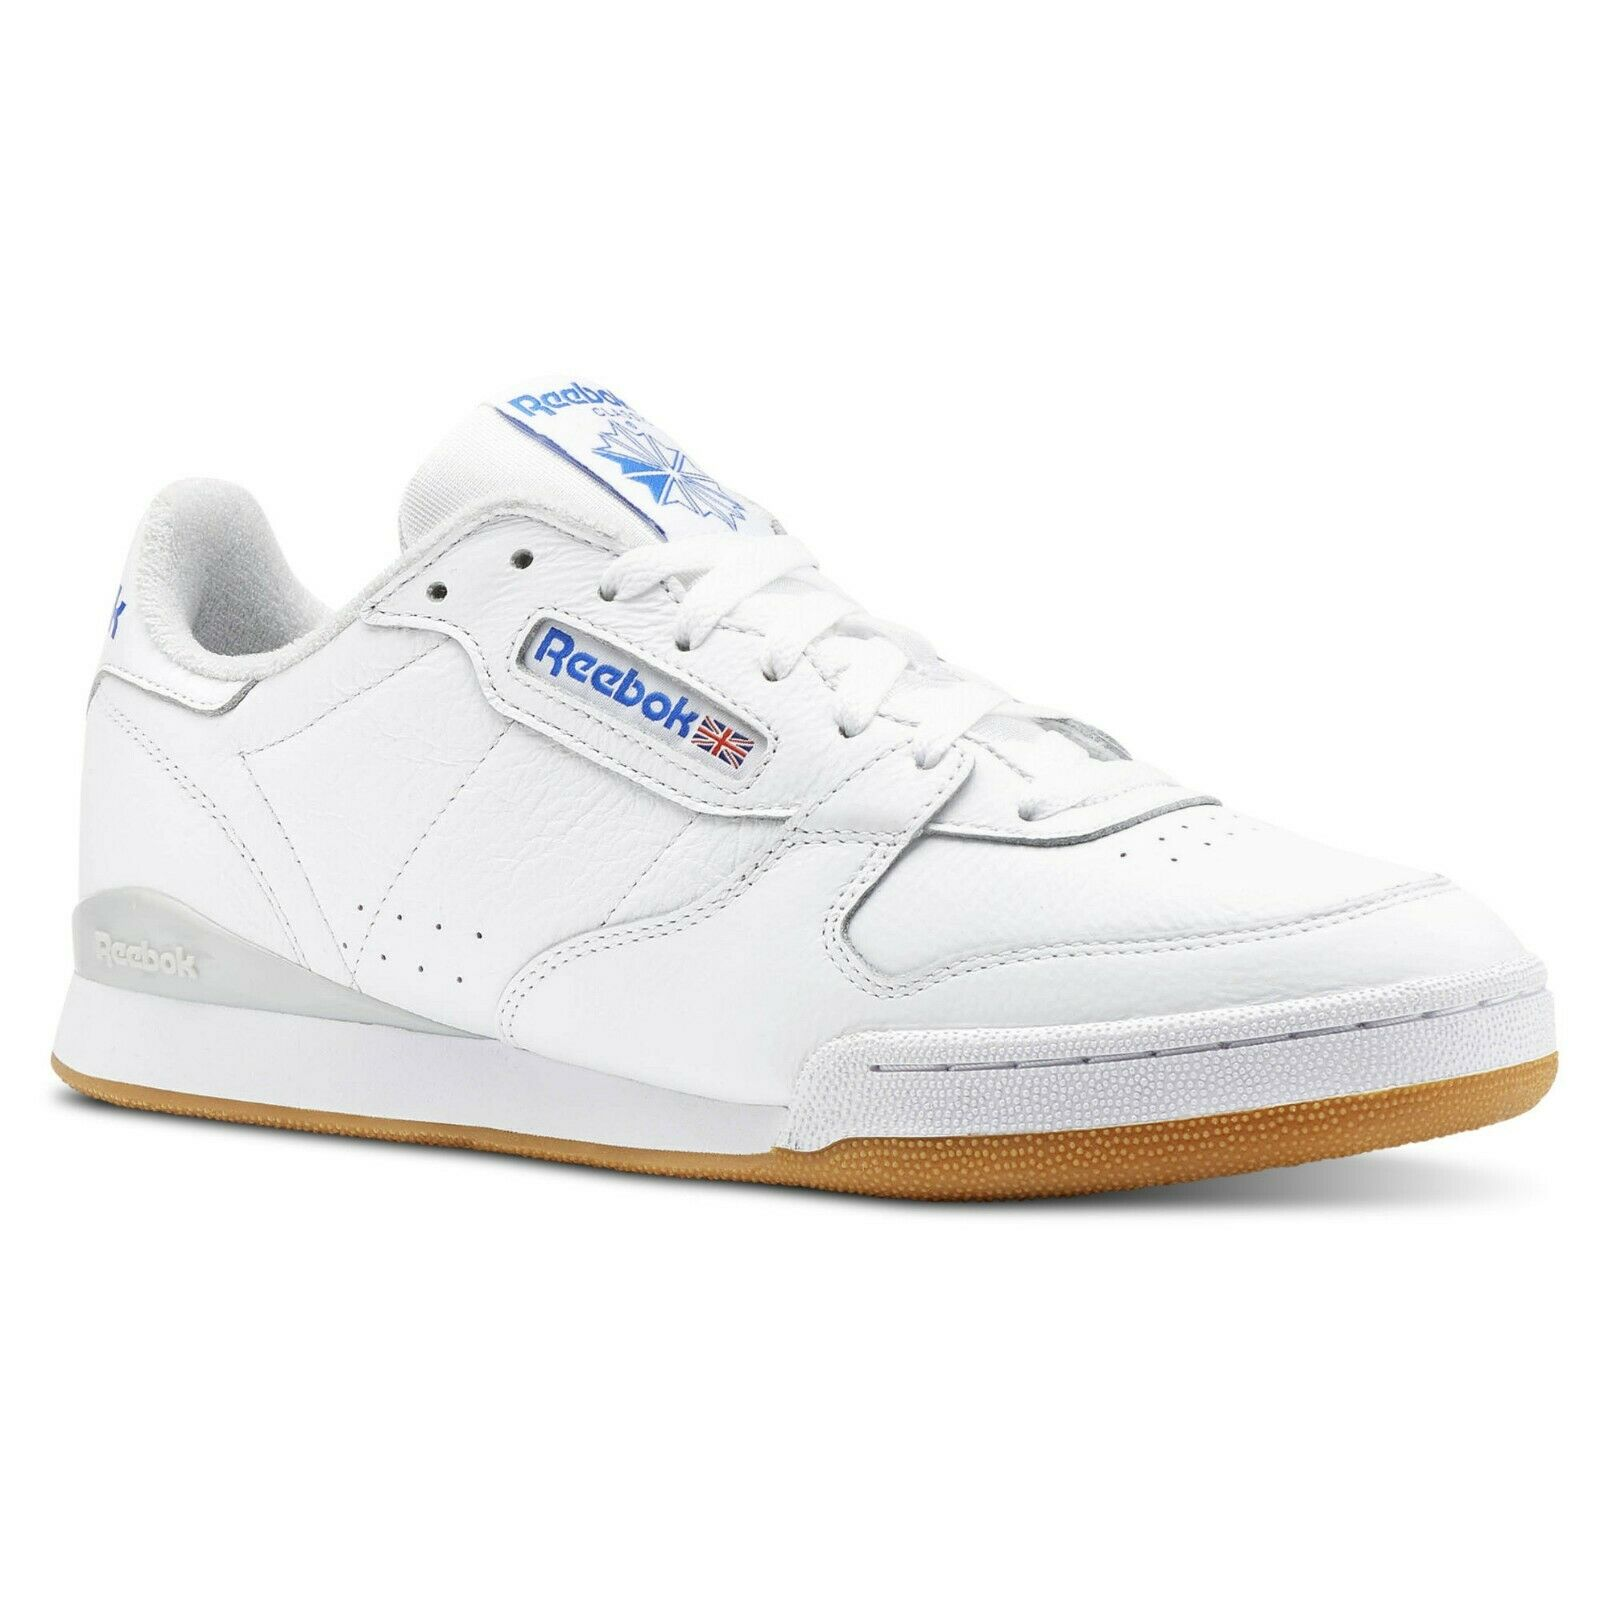 REEBOK CLASSICS PHASE 1 Goma blancooo Zapatillas Nuevo Tenis Zapatos Retro 80S 90S Rara